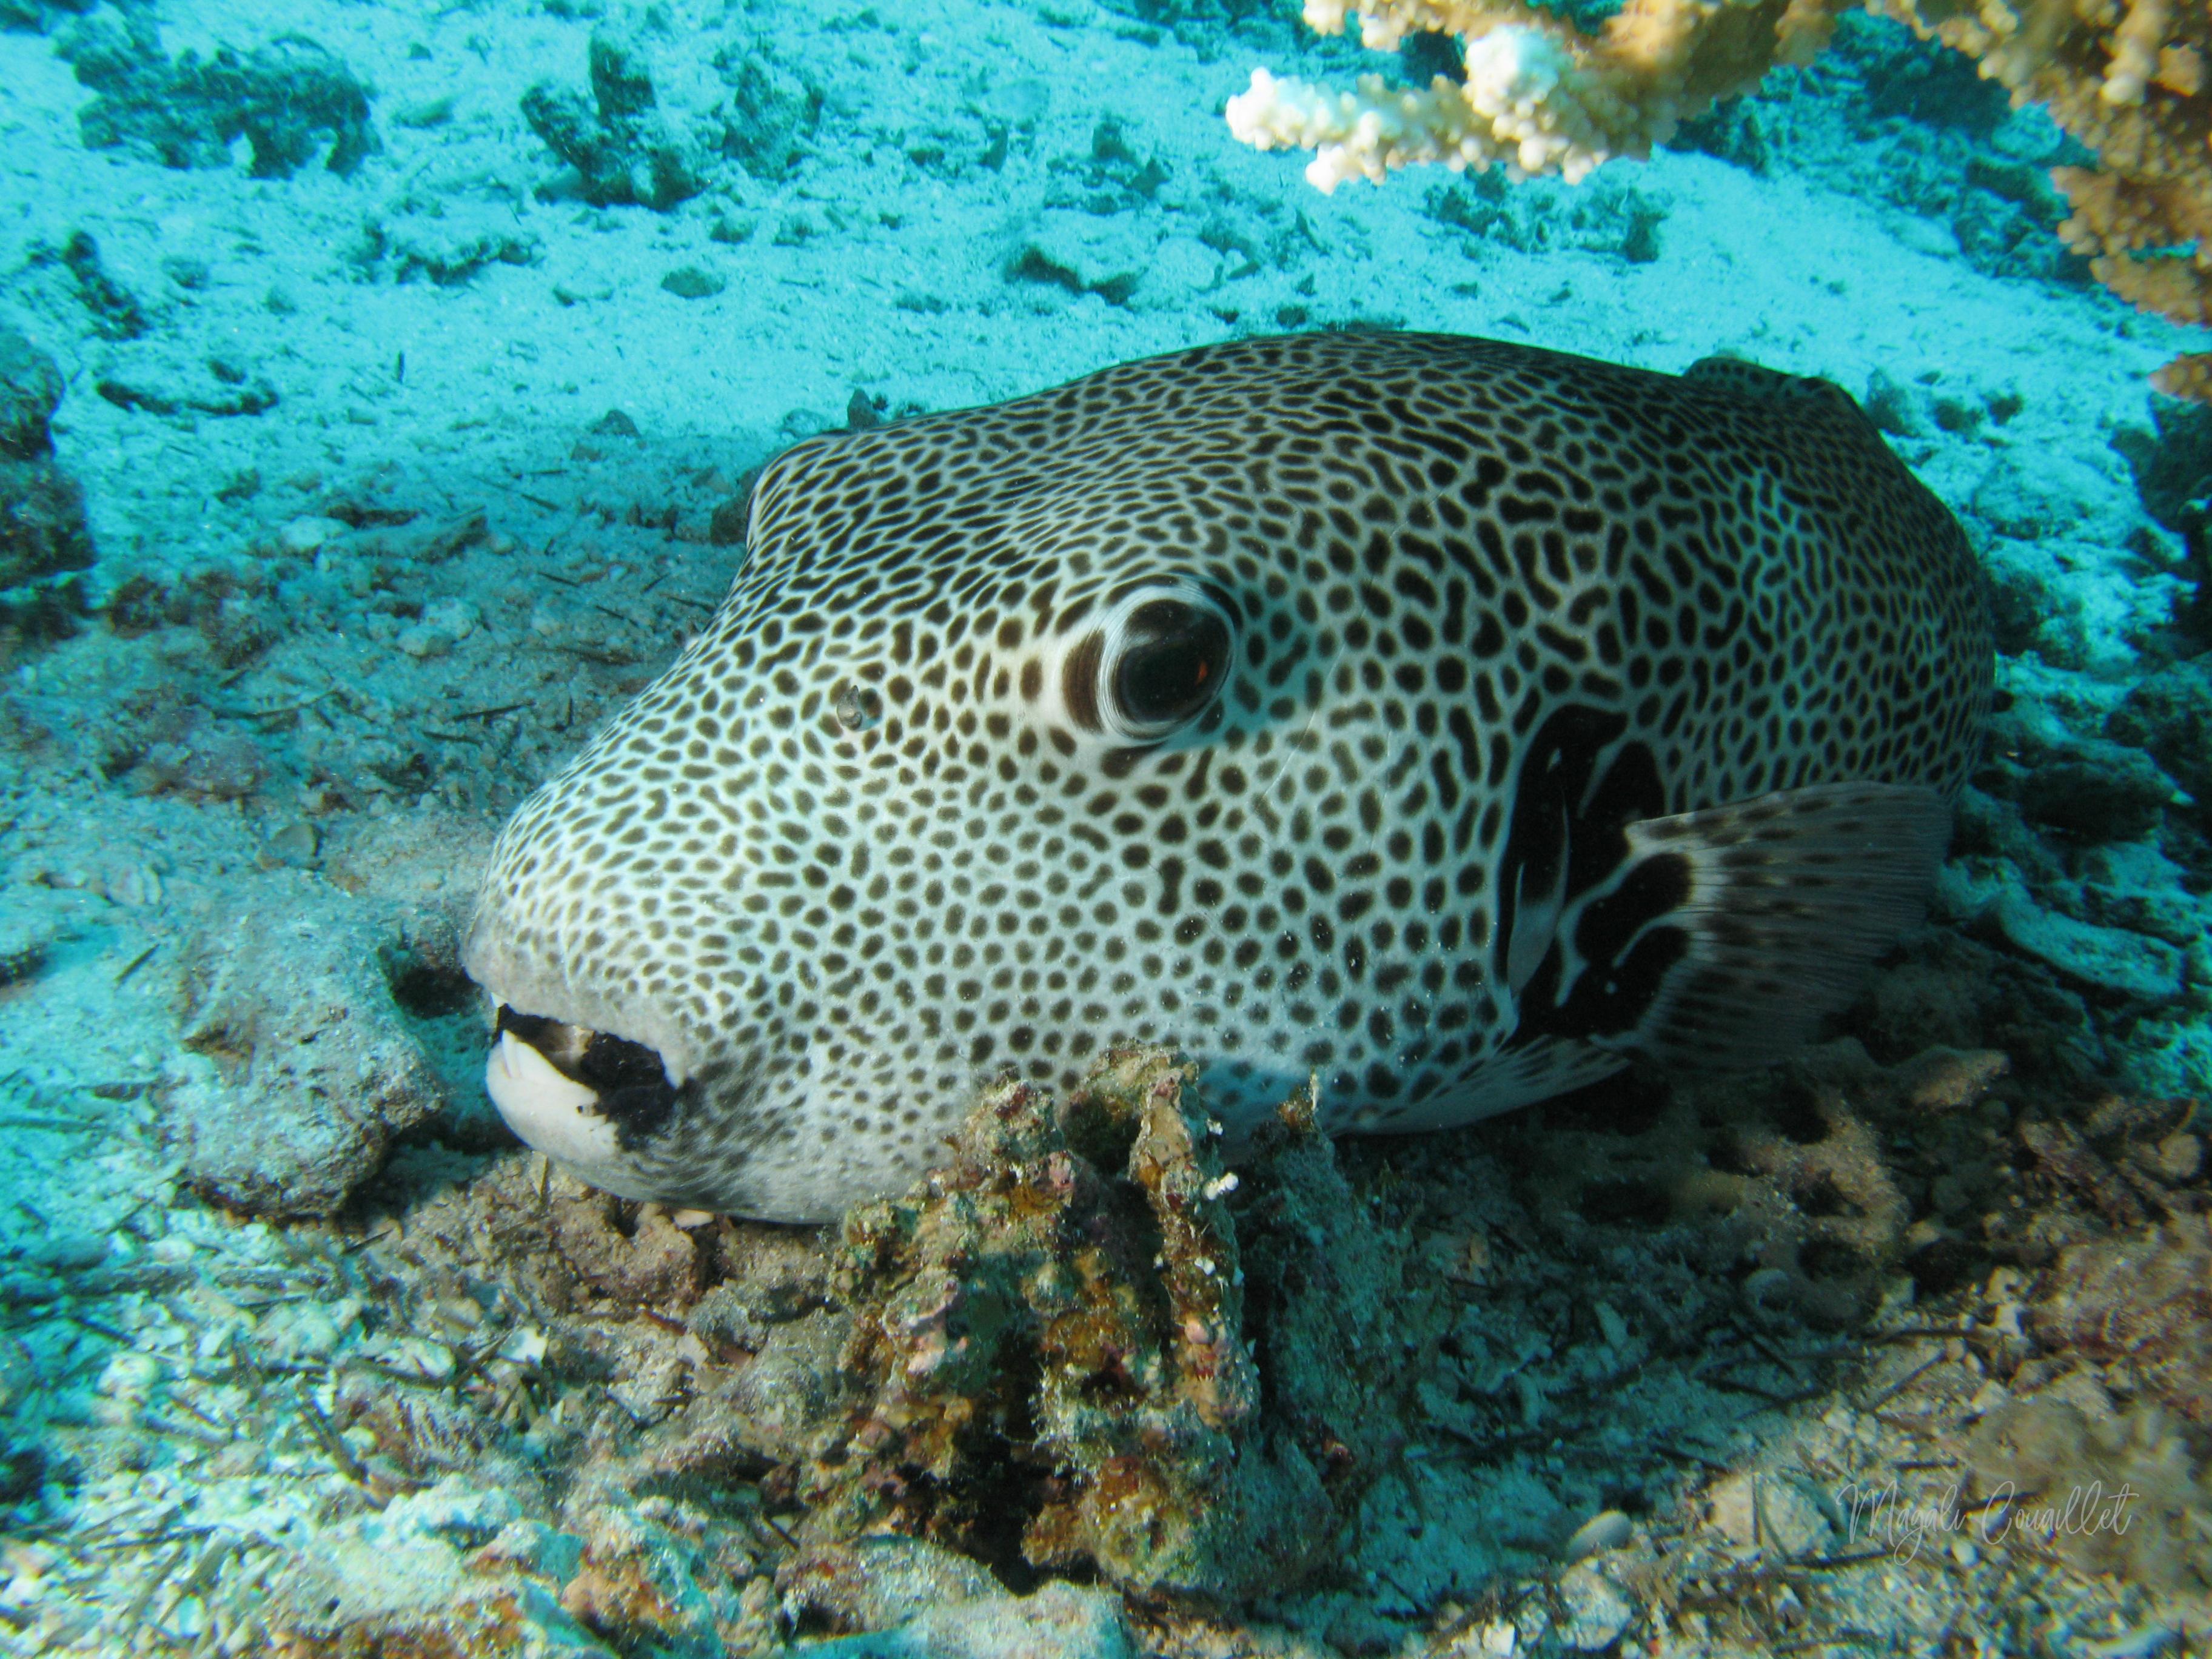 Poisson-ballon étoilé - Star Pufferfish